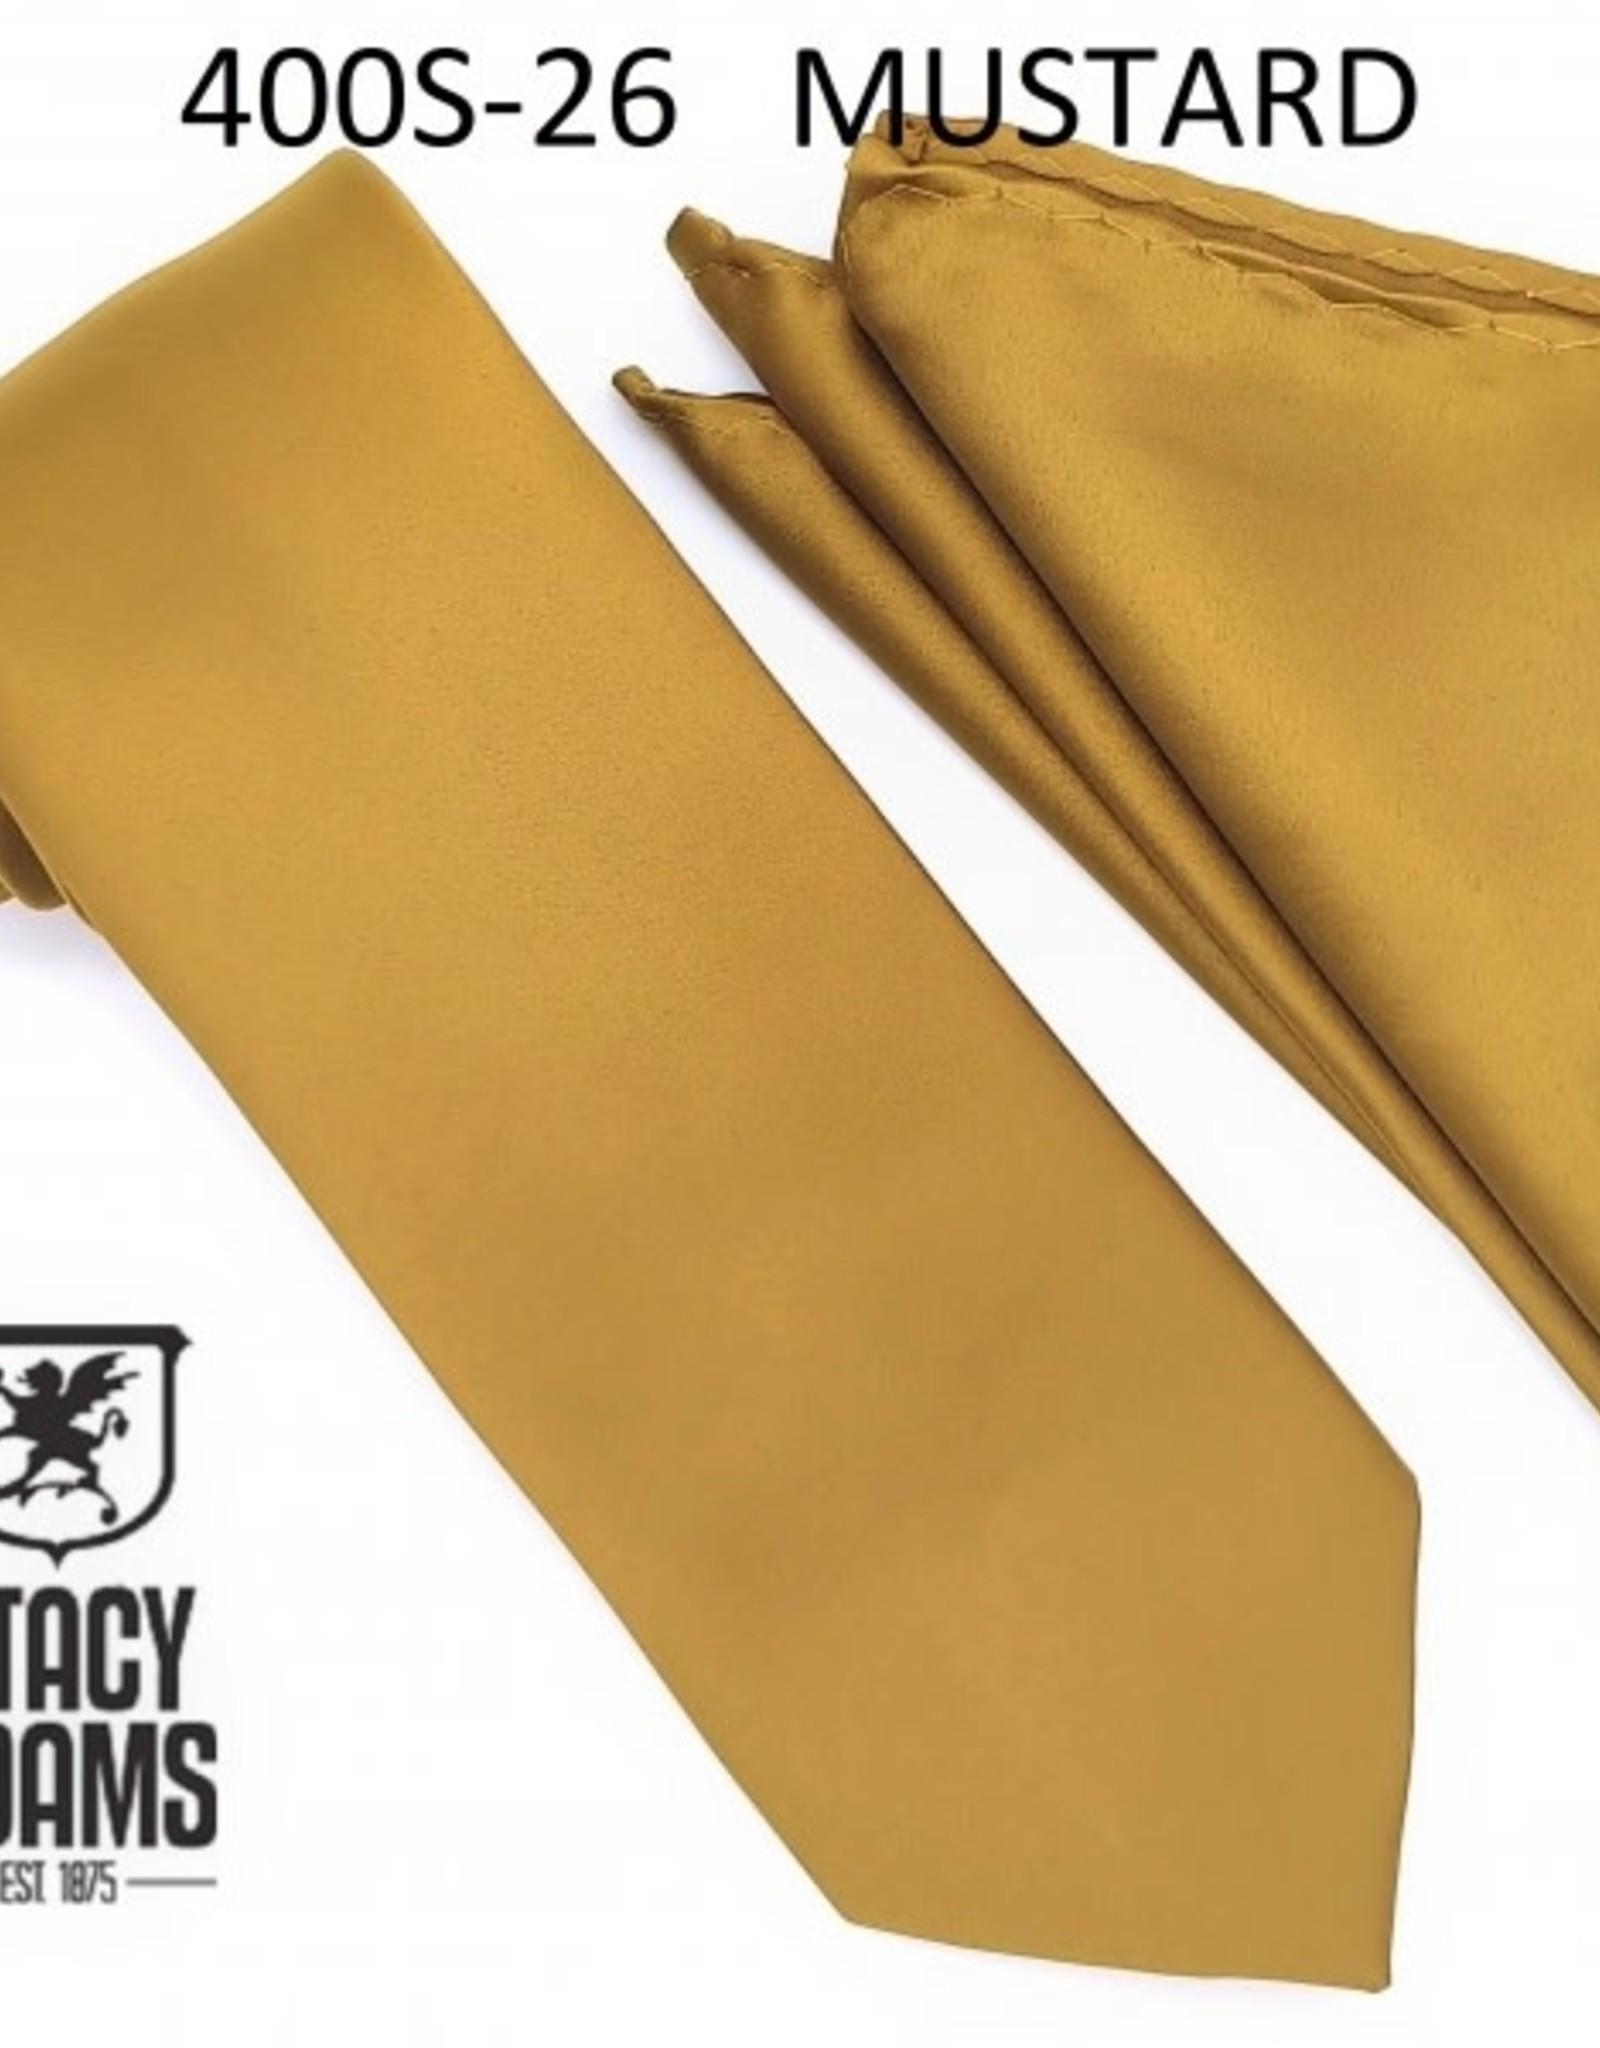 Stacy Adams Tie Stacy Adams Reg 400S-26 Mustard